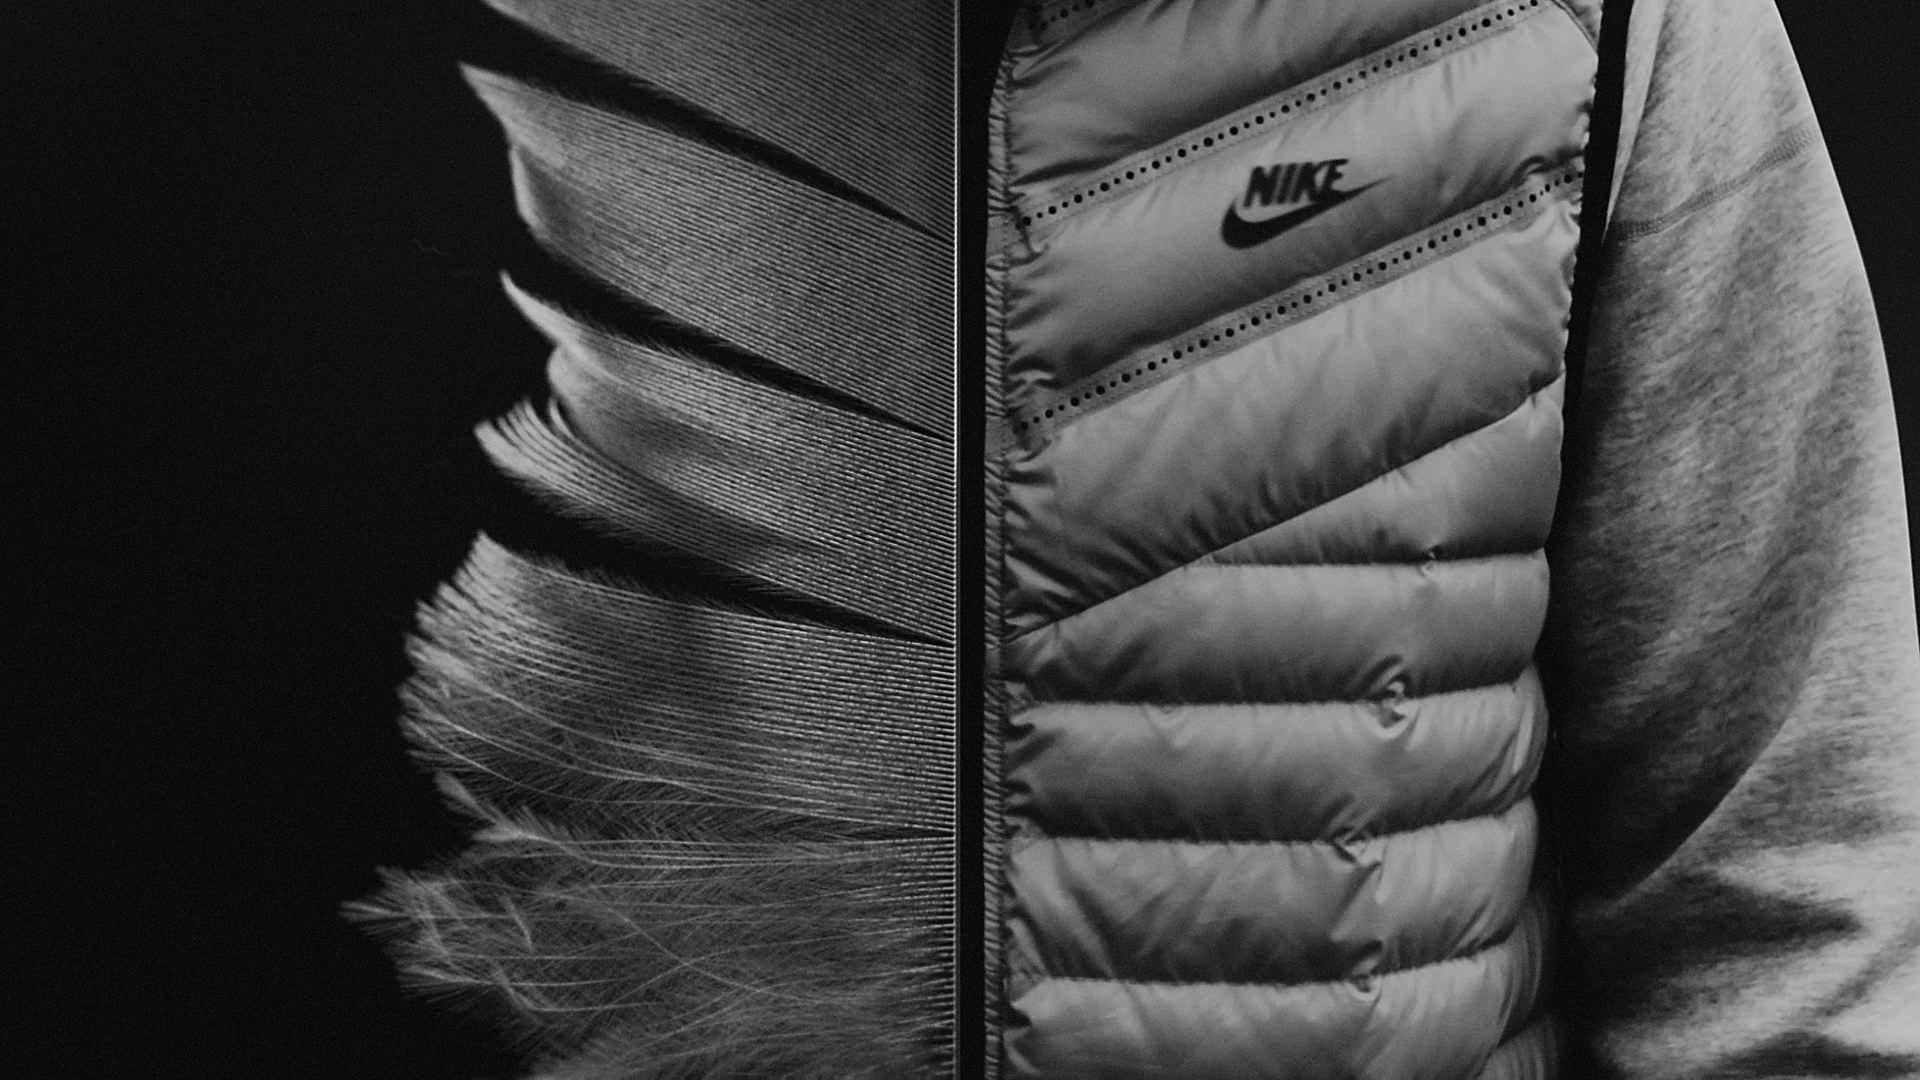 Glassworks Brings Nike's Aeroloft to Life in Striking New Film